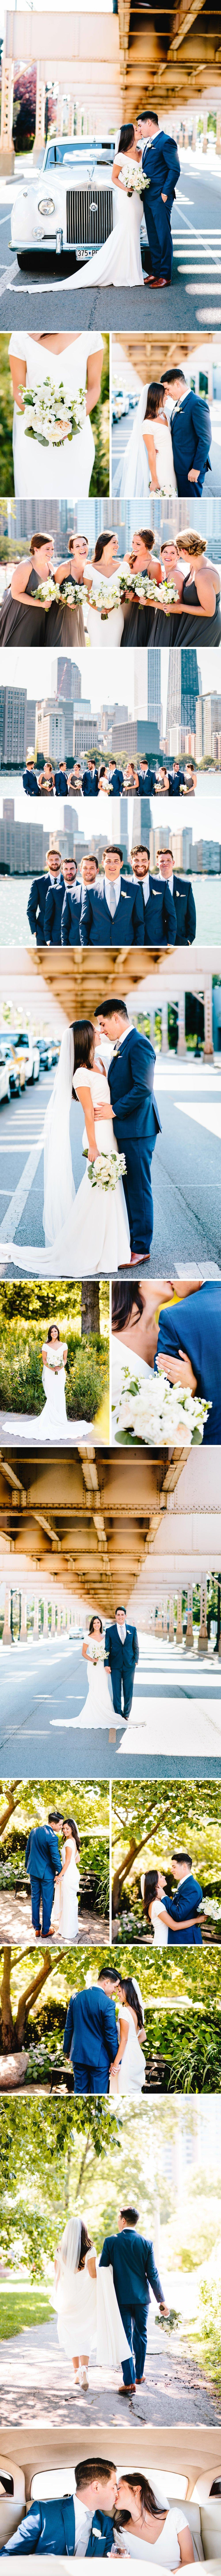 chicago-fine-art-wedding-photography-penninger10